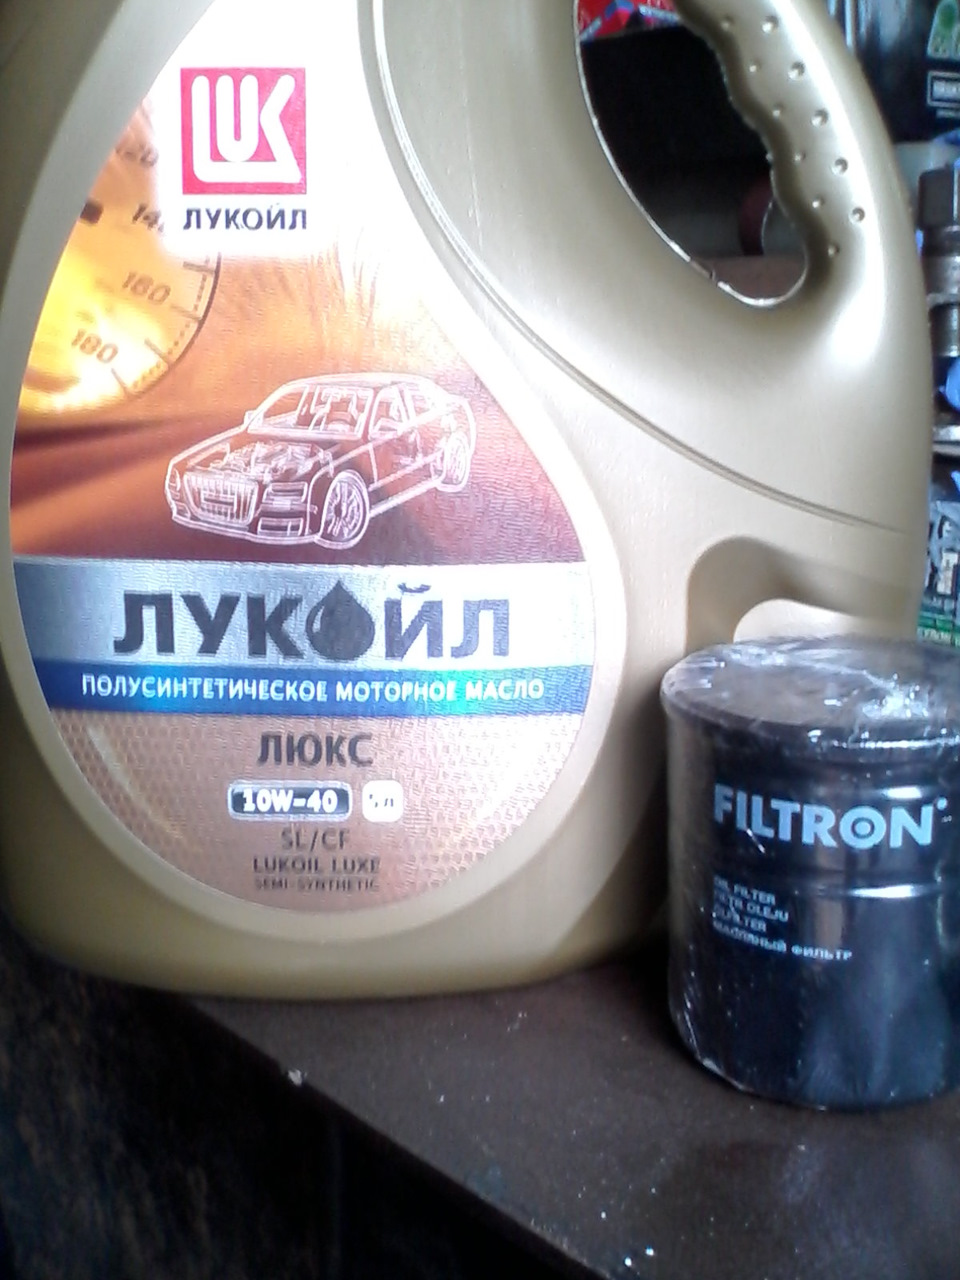 Замена масла и заднего тормозного цилиндра.